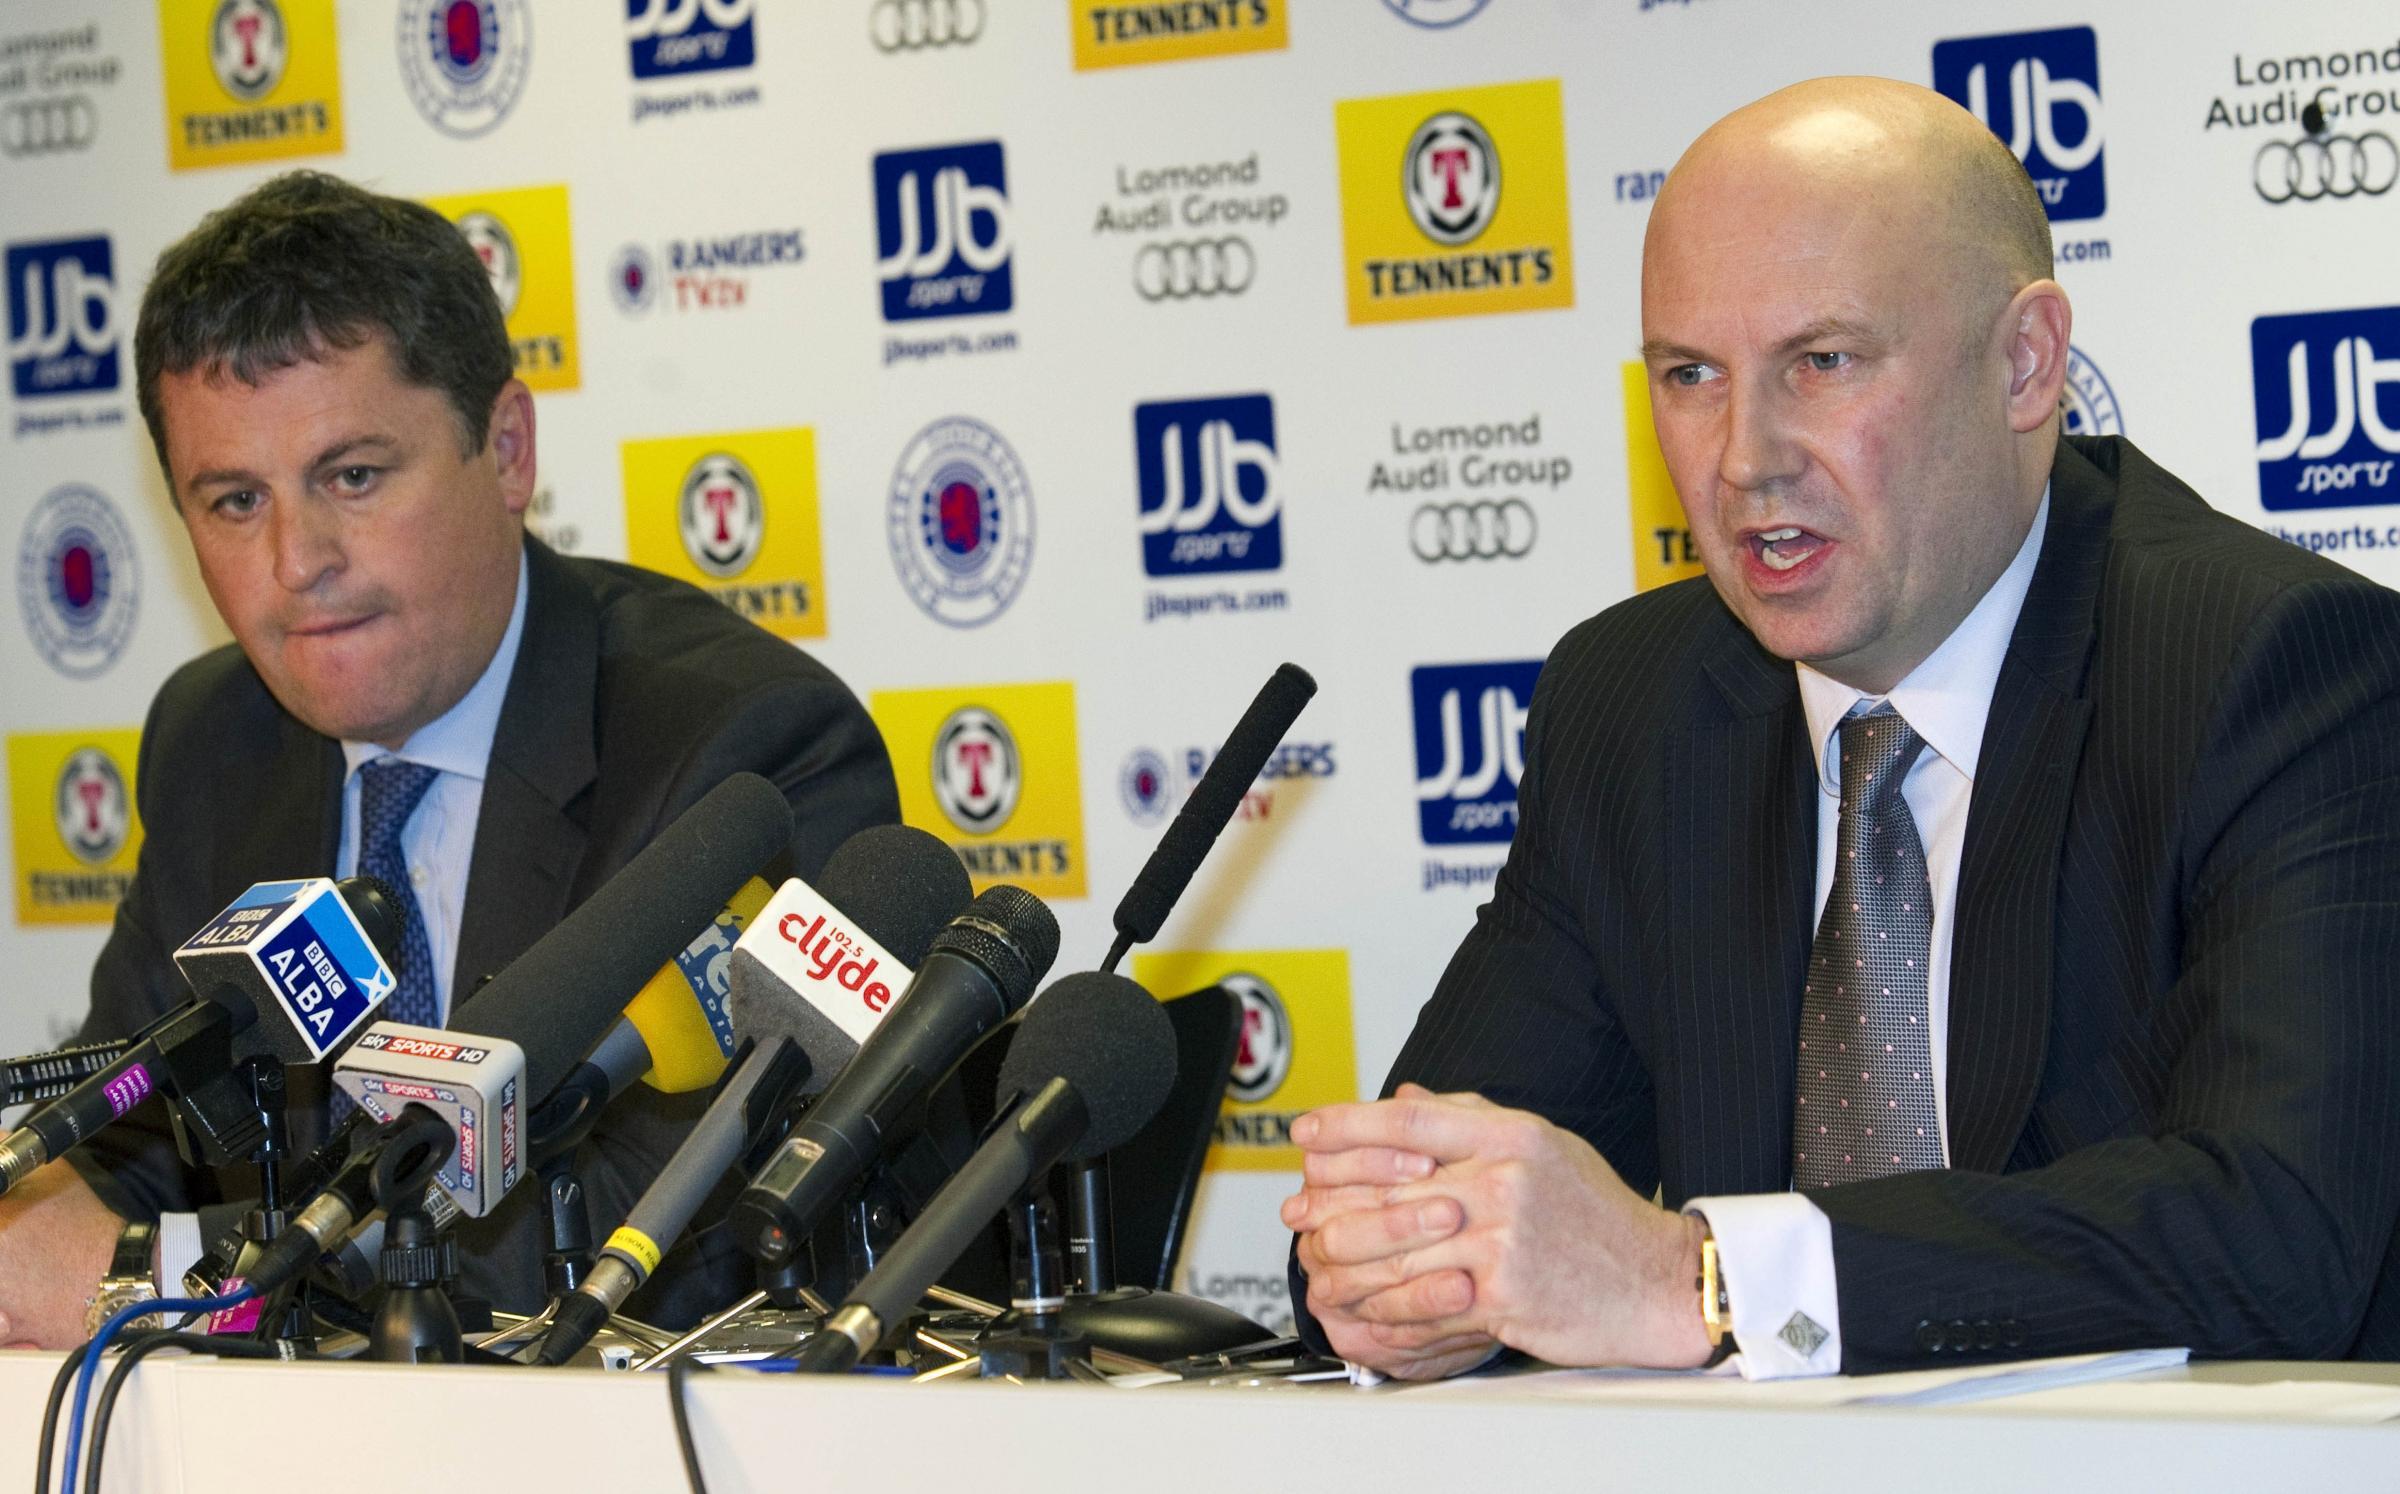 Nicola Sturgeon backs a non Scottish Judge for Rangers administrators inquiry